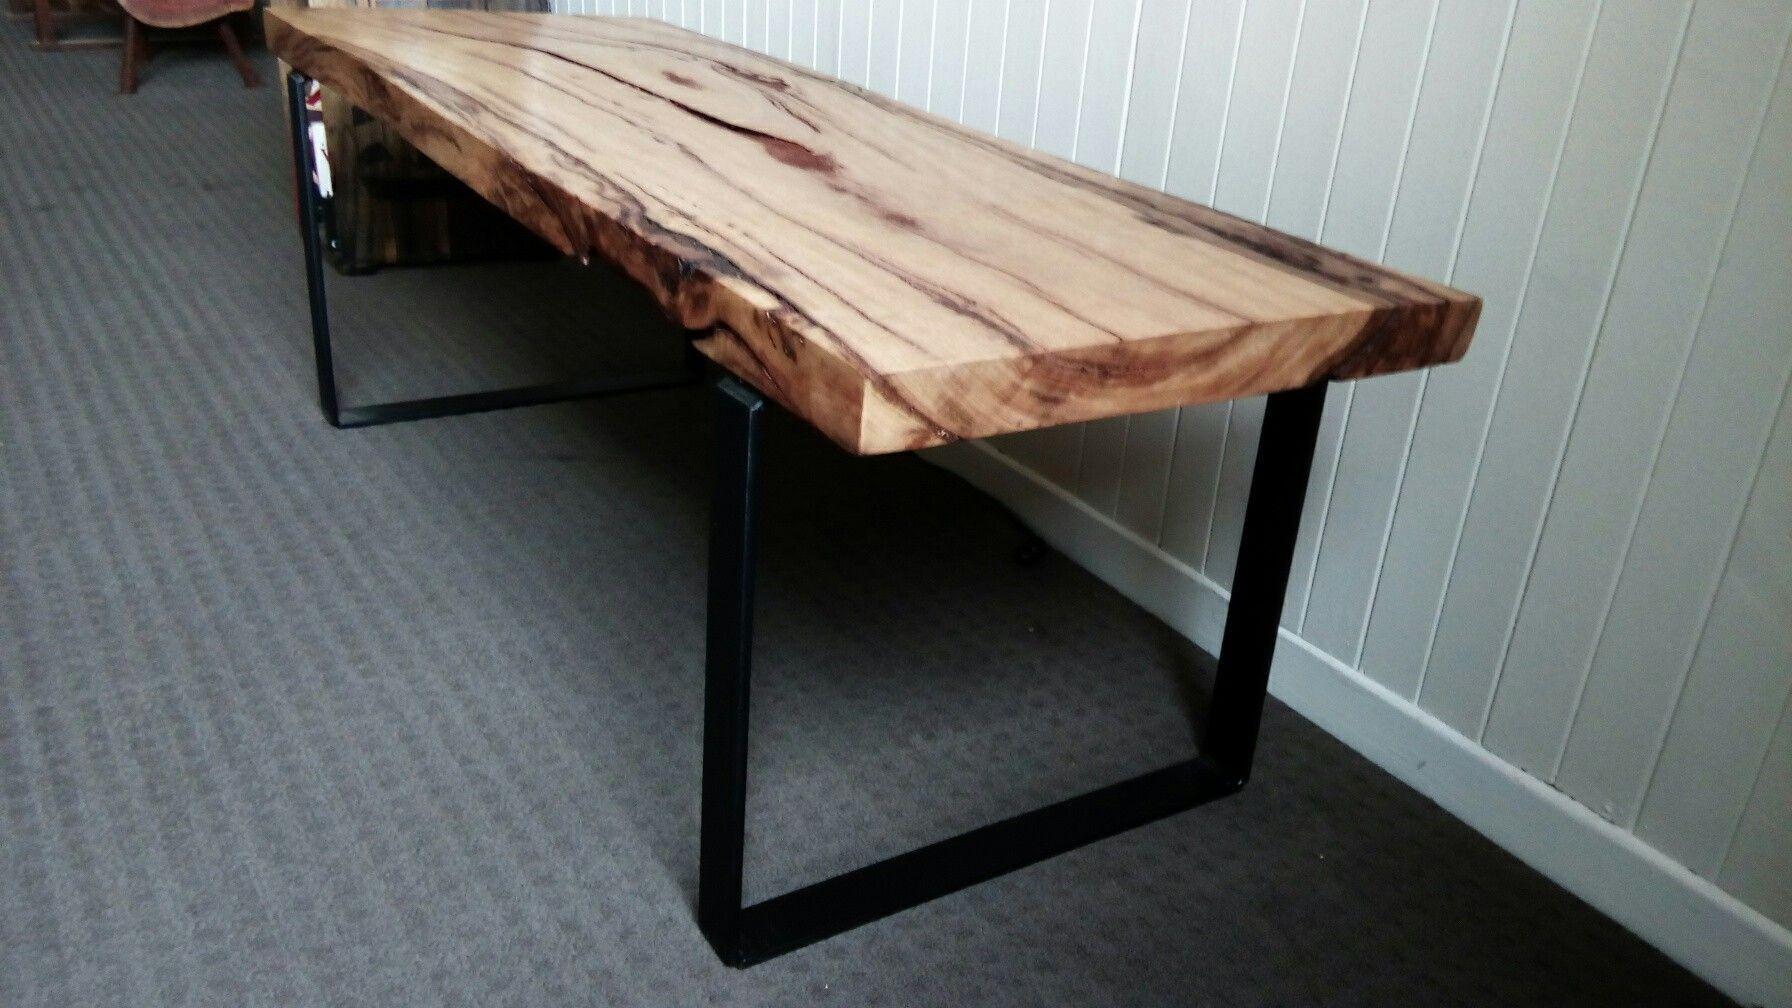 A Marri Slab And Squared Steel Leg Coffee Table From Workshop87 Trunk Furniture Seasoned Wood Furniture Making [ 1008 x 1792 Pixel ]